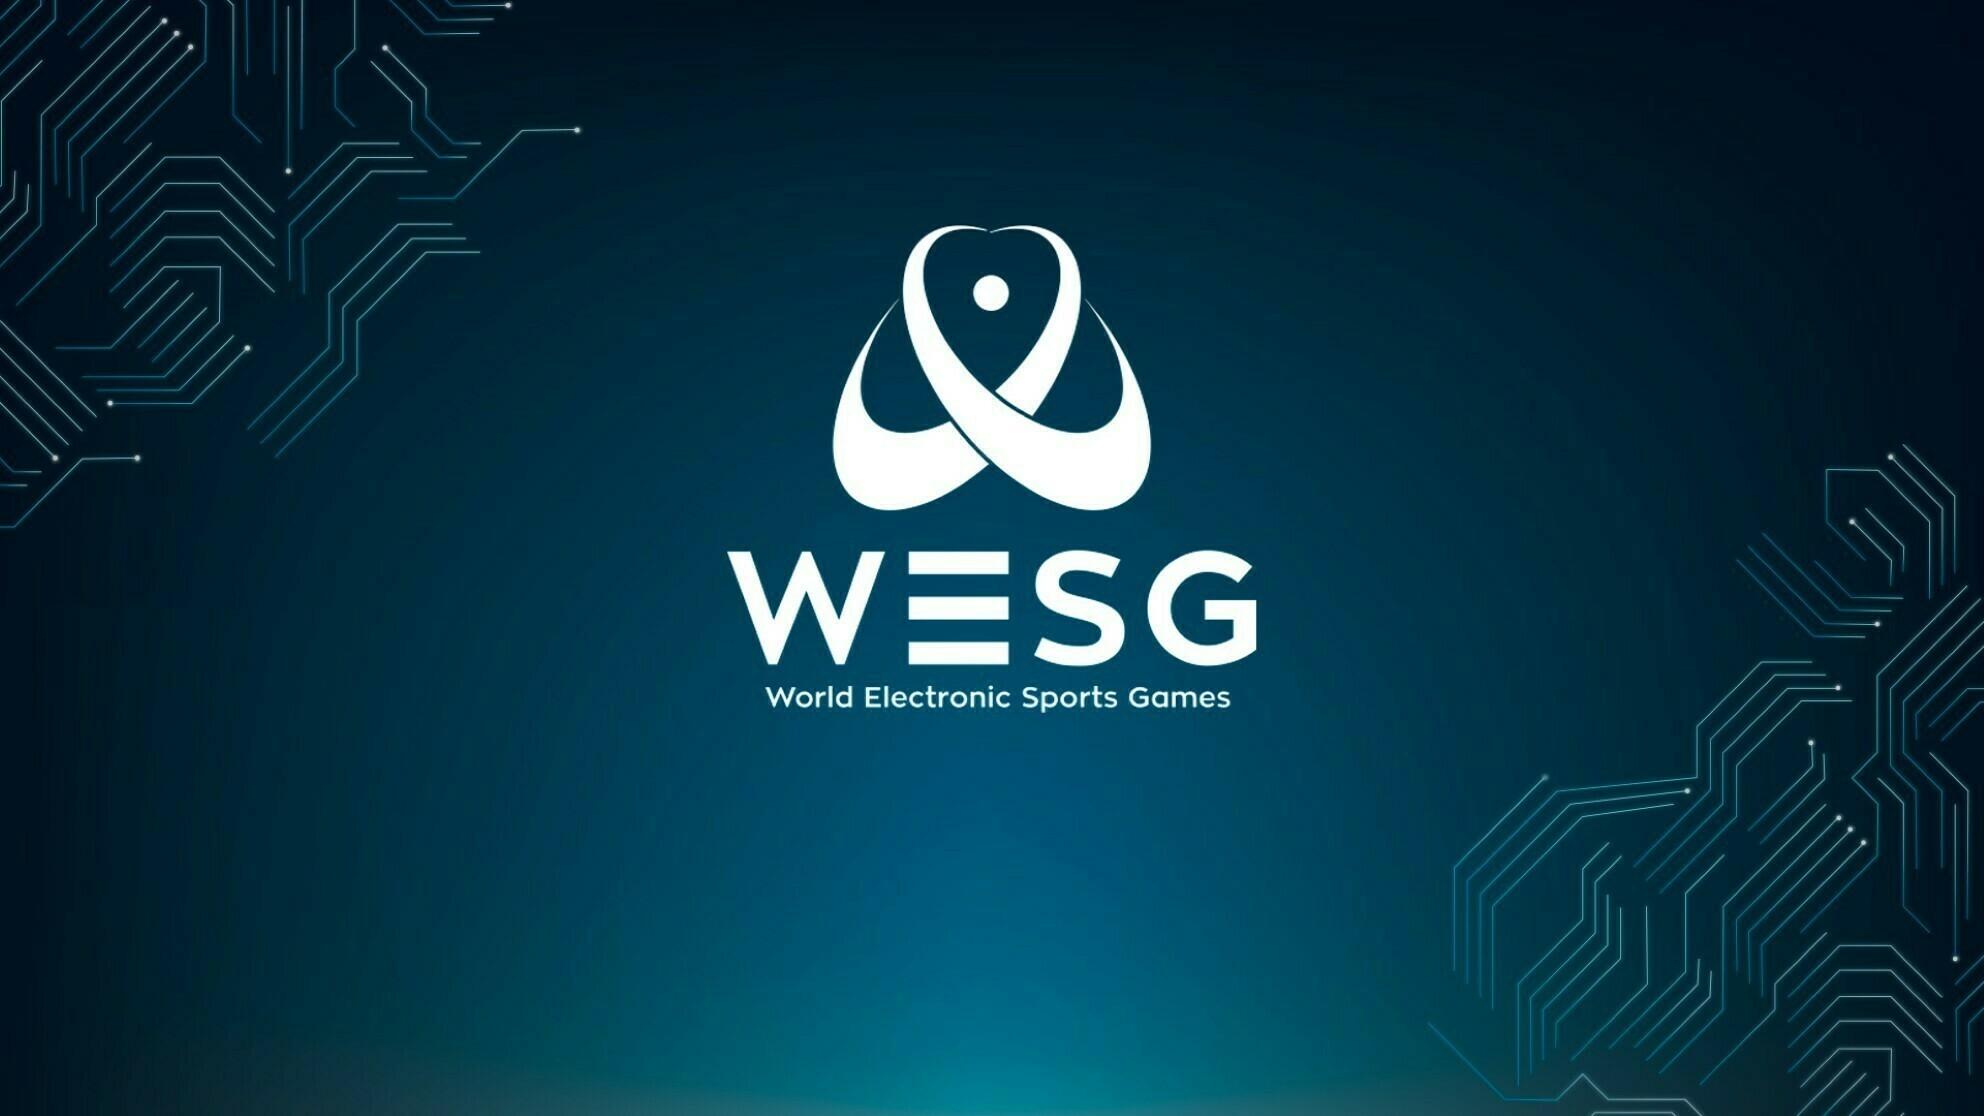 Fighting PandaS квалифицировалась на WESG 2019 по Dota 2